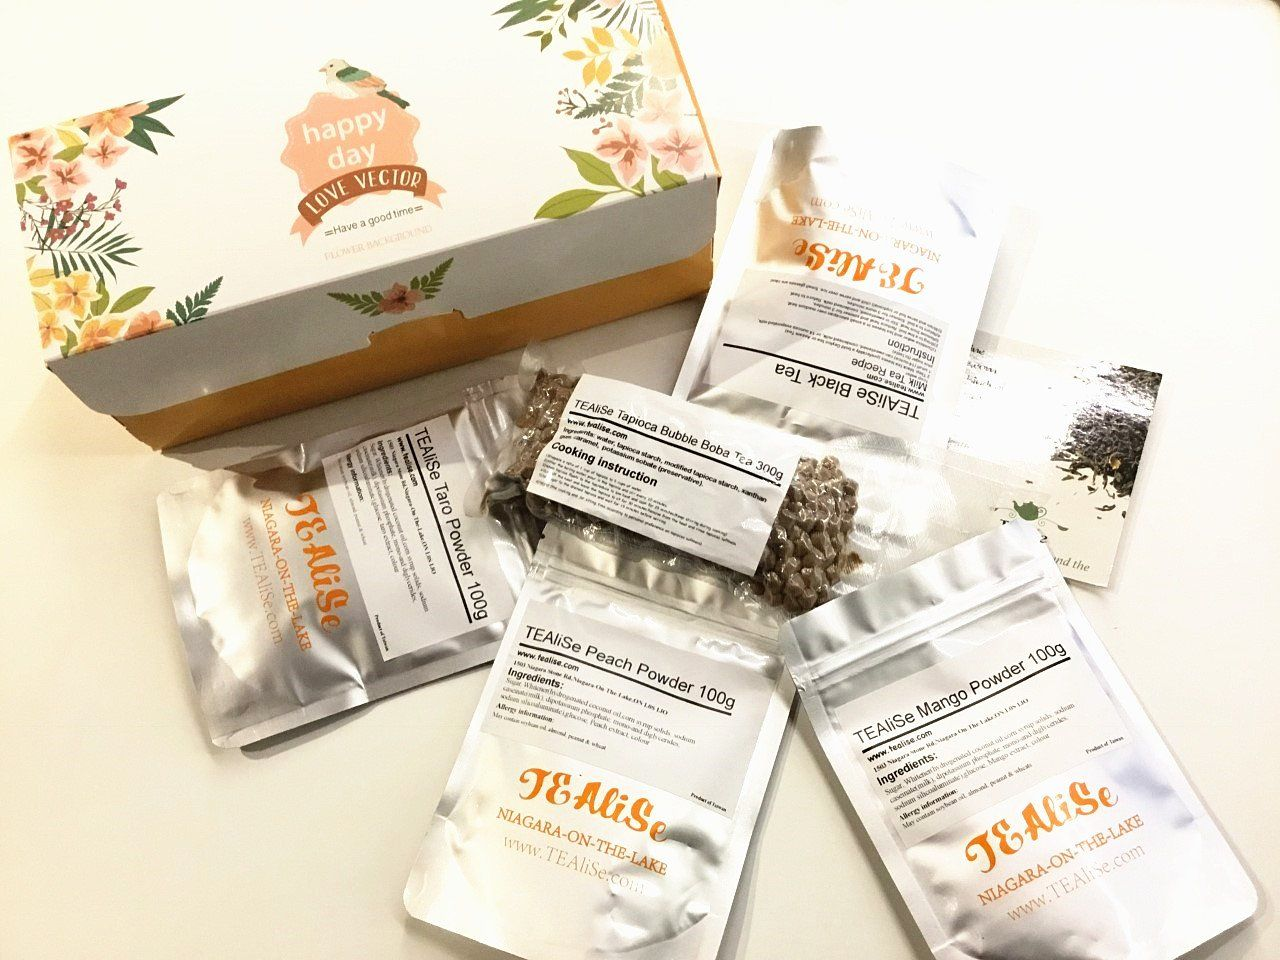 Best selling boba tea 3 flavors kit tea boba tapioca gift